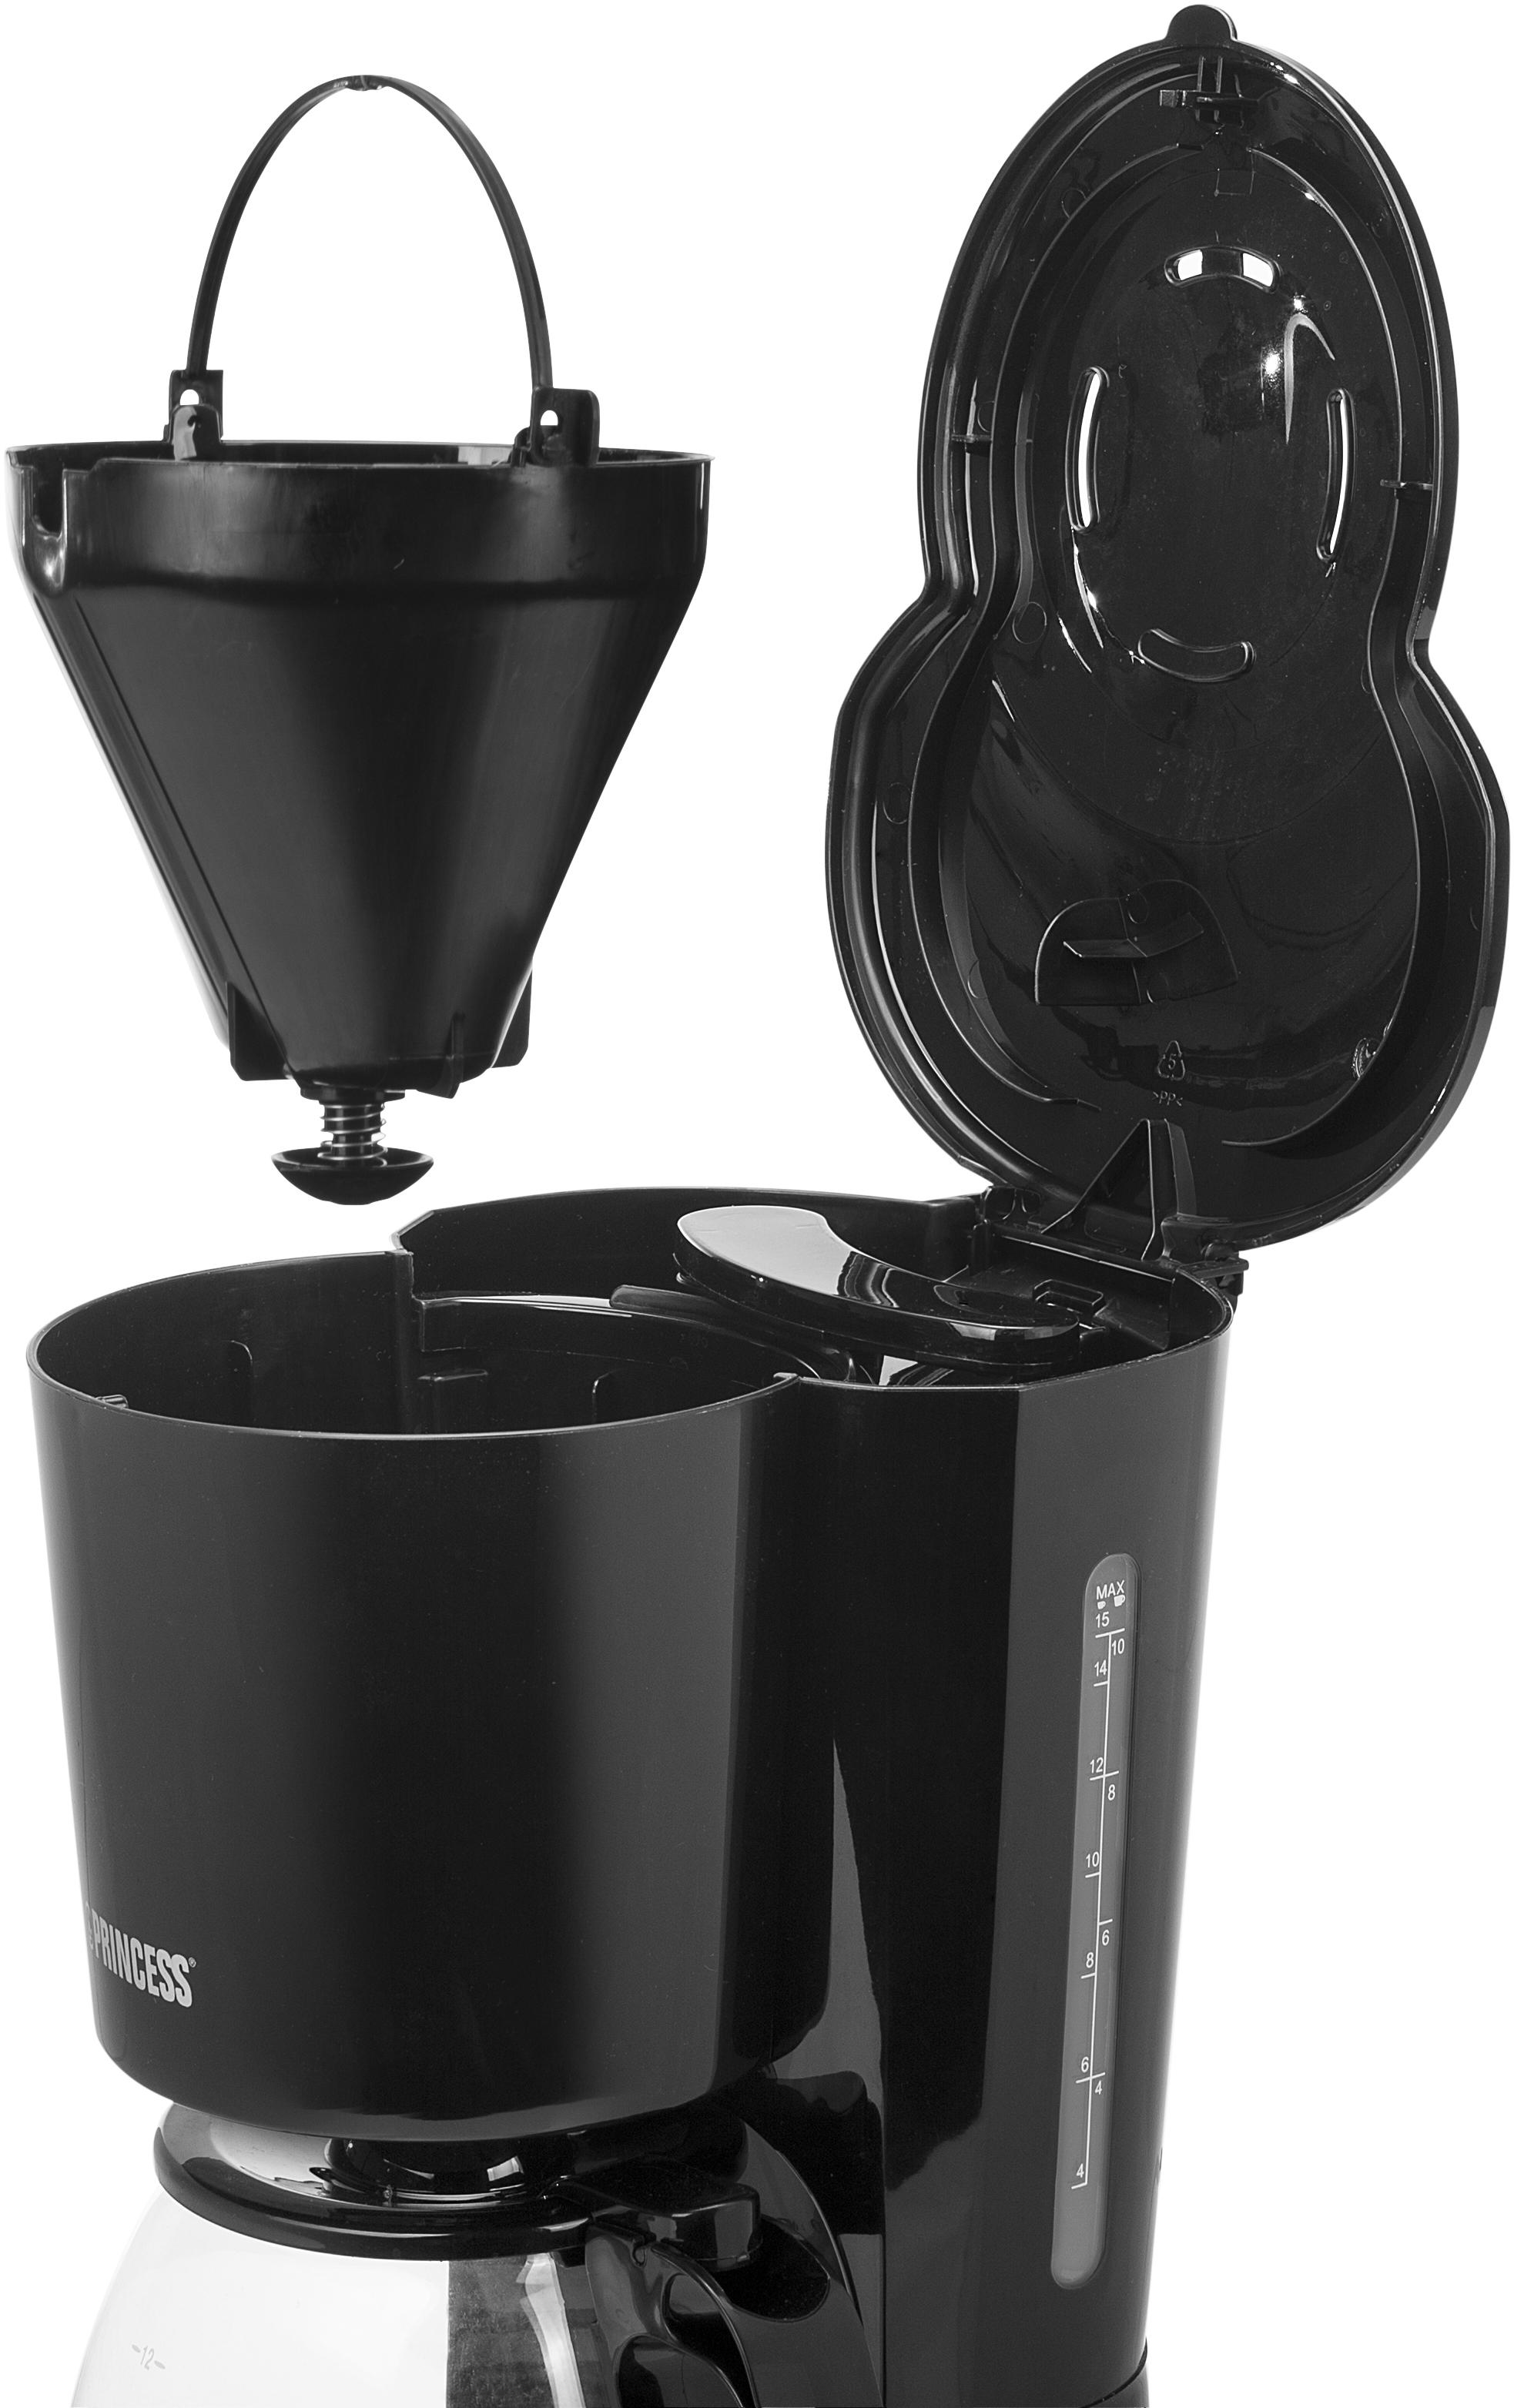 062c8cdd1da Princess 246007 Coffee Maker Classic Black Deluxe - Kenmerken - Tweakers